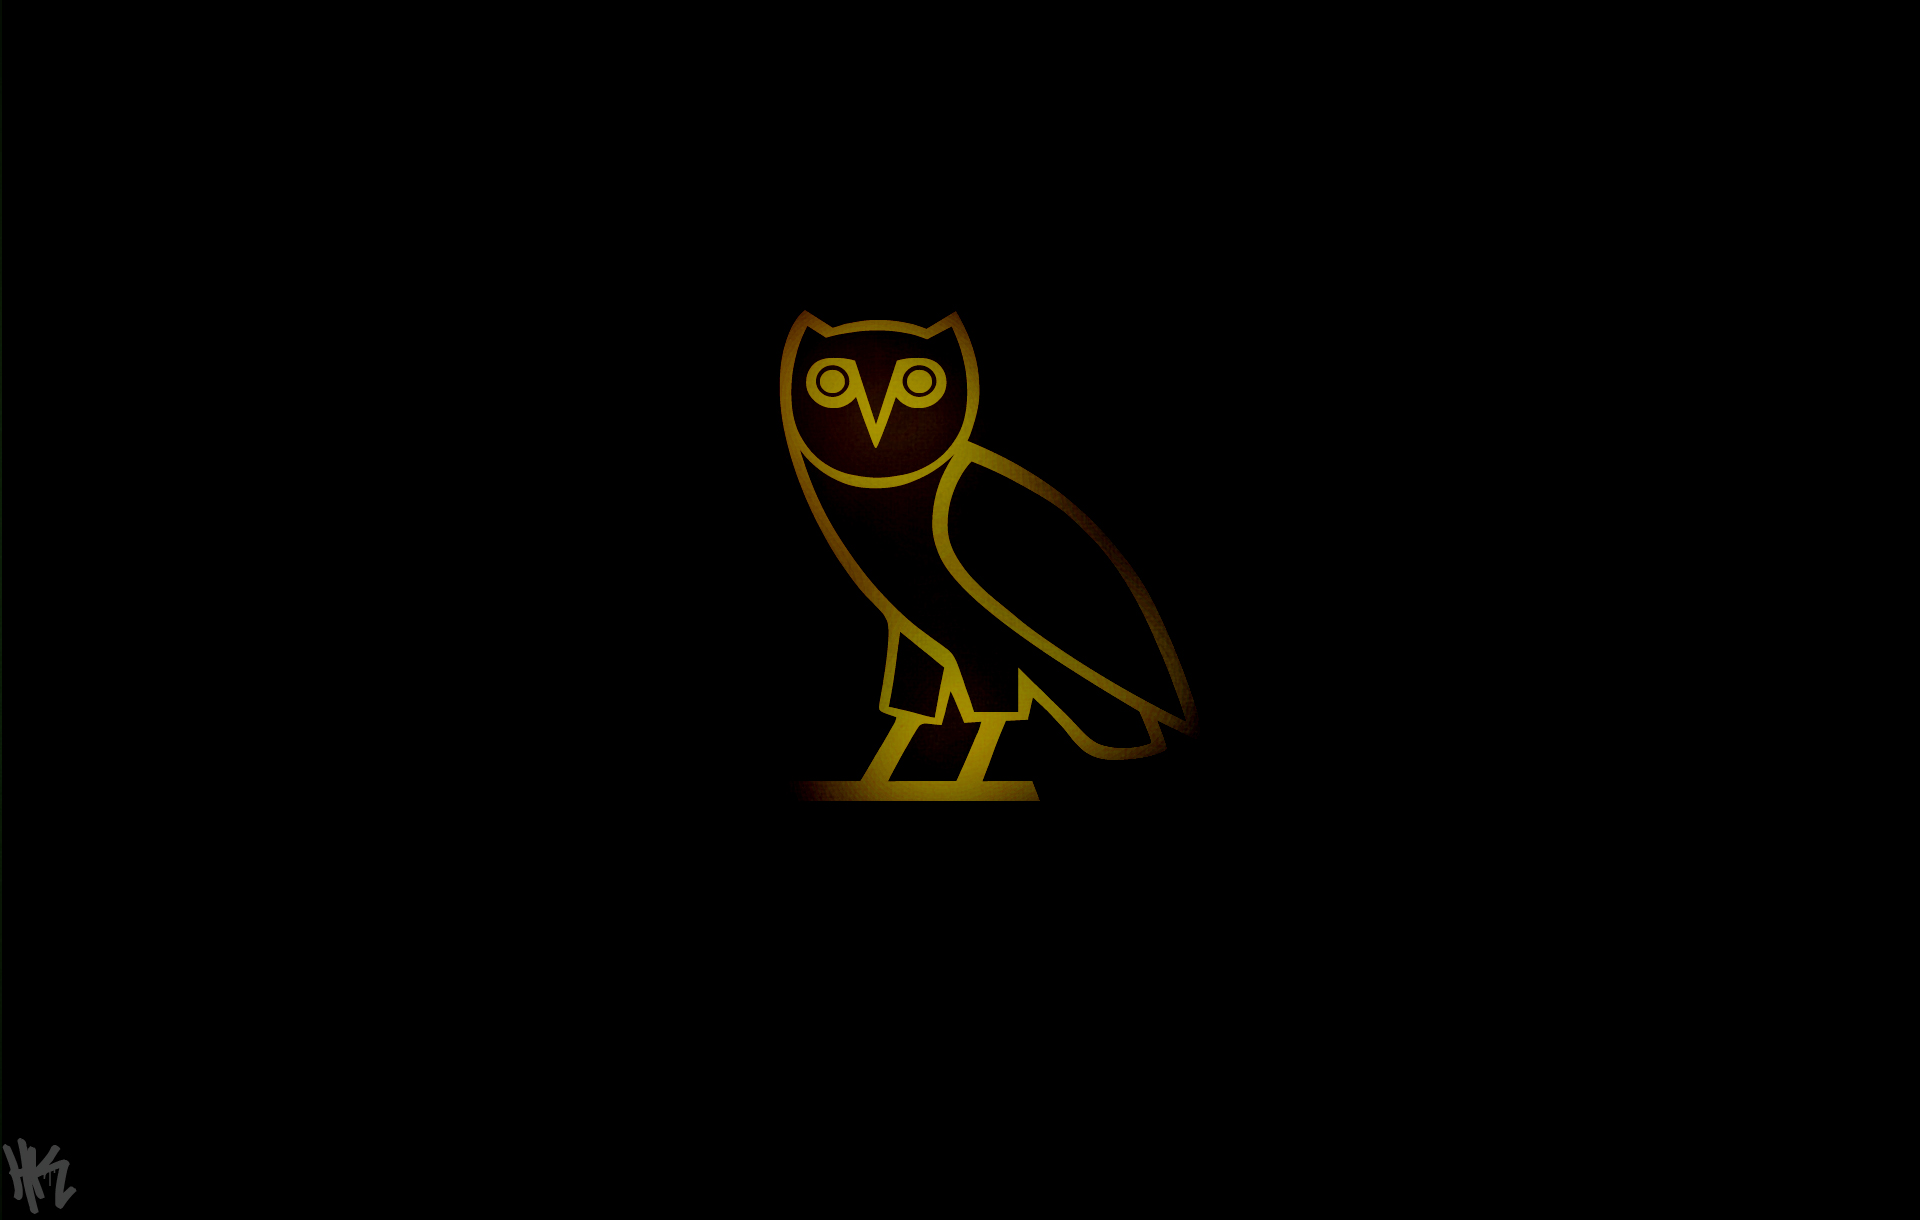 Ovo Owl Wallpaper Iphone Ovo 1920x1220